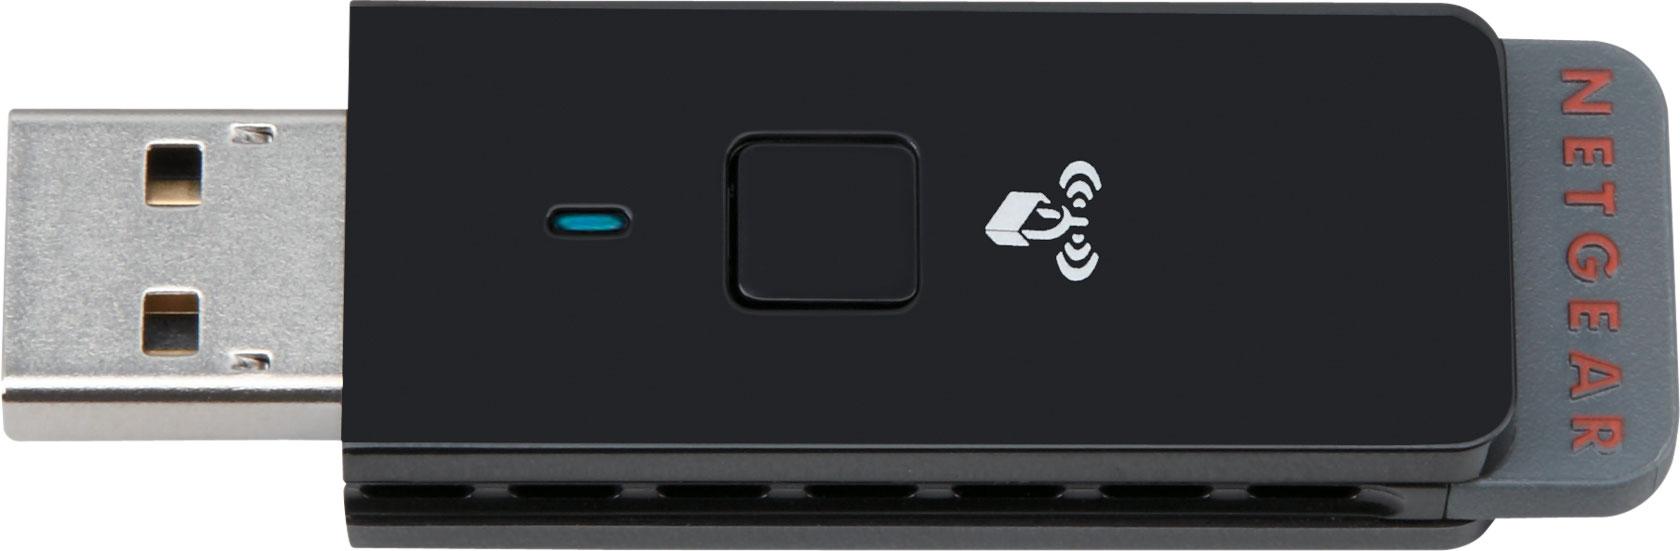 Netgear N150 Wireless Adapter Driver